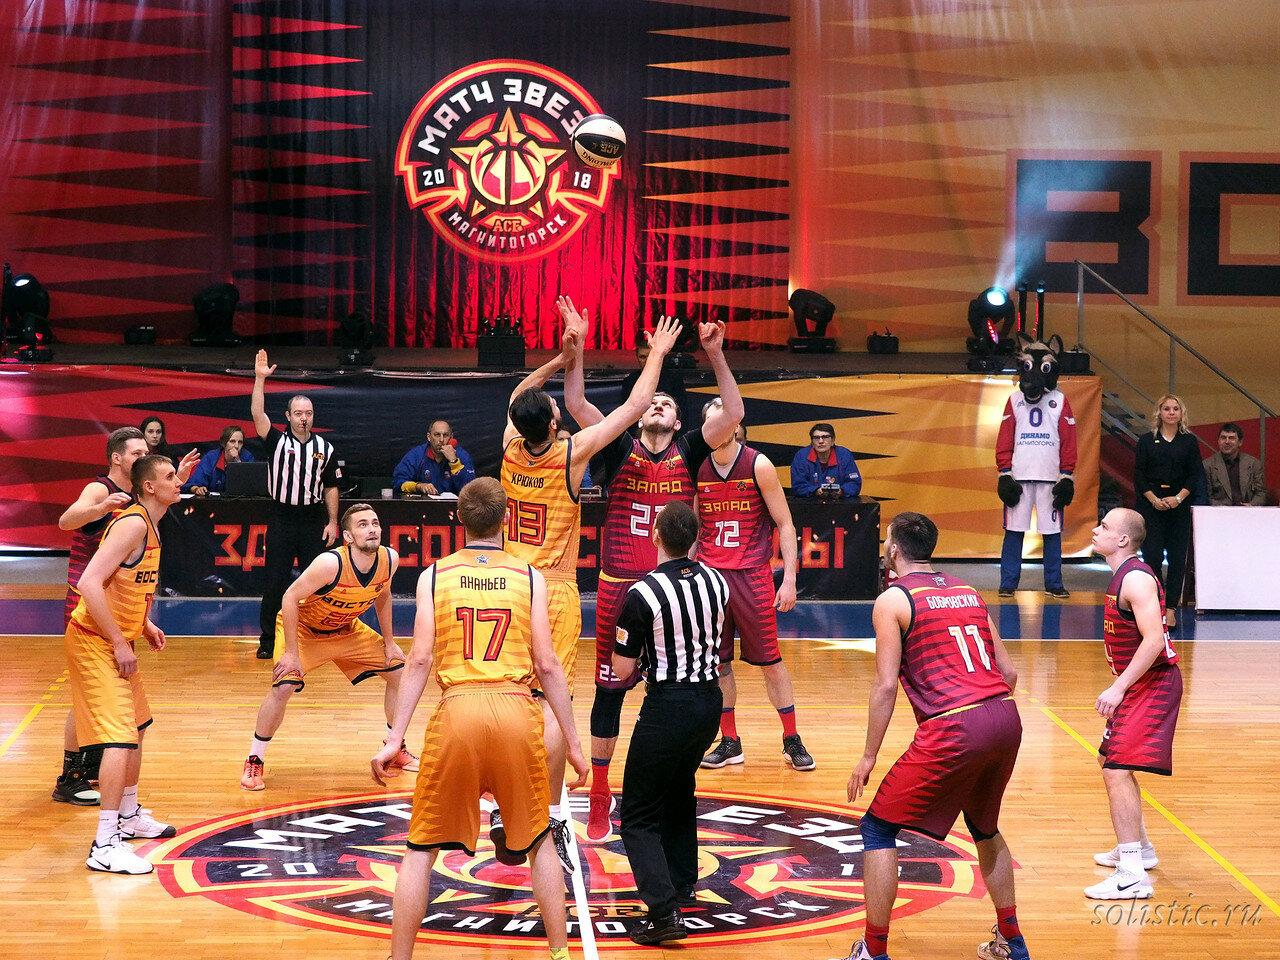 58 Матч звезд АСБ 2018 (ассоциации студенческого баскетбола)